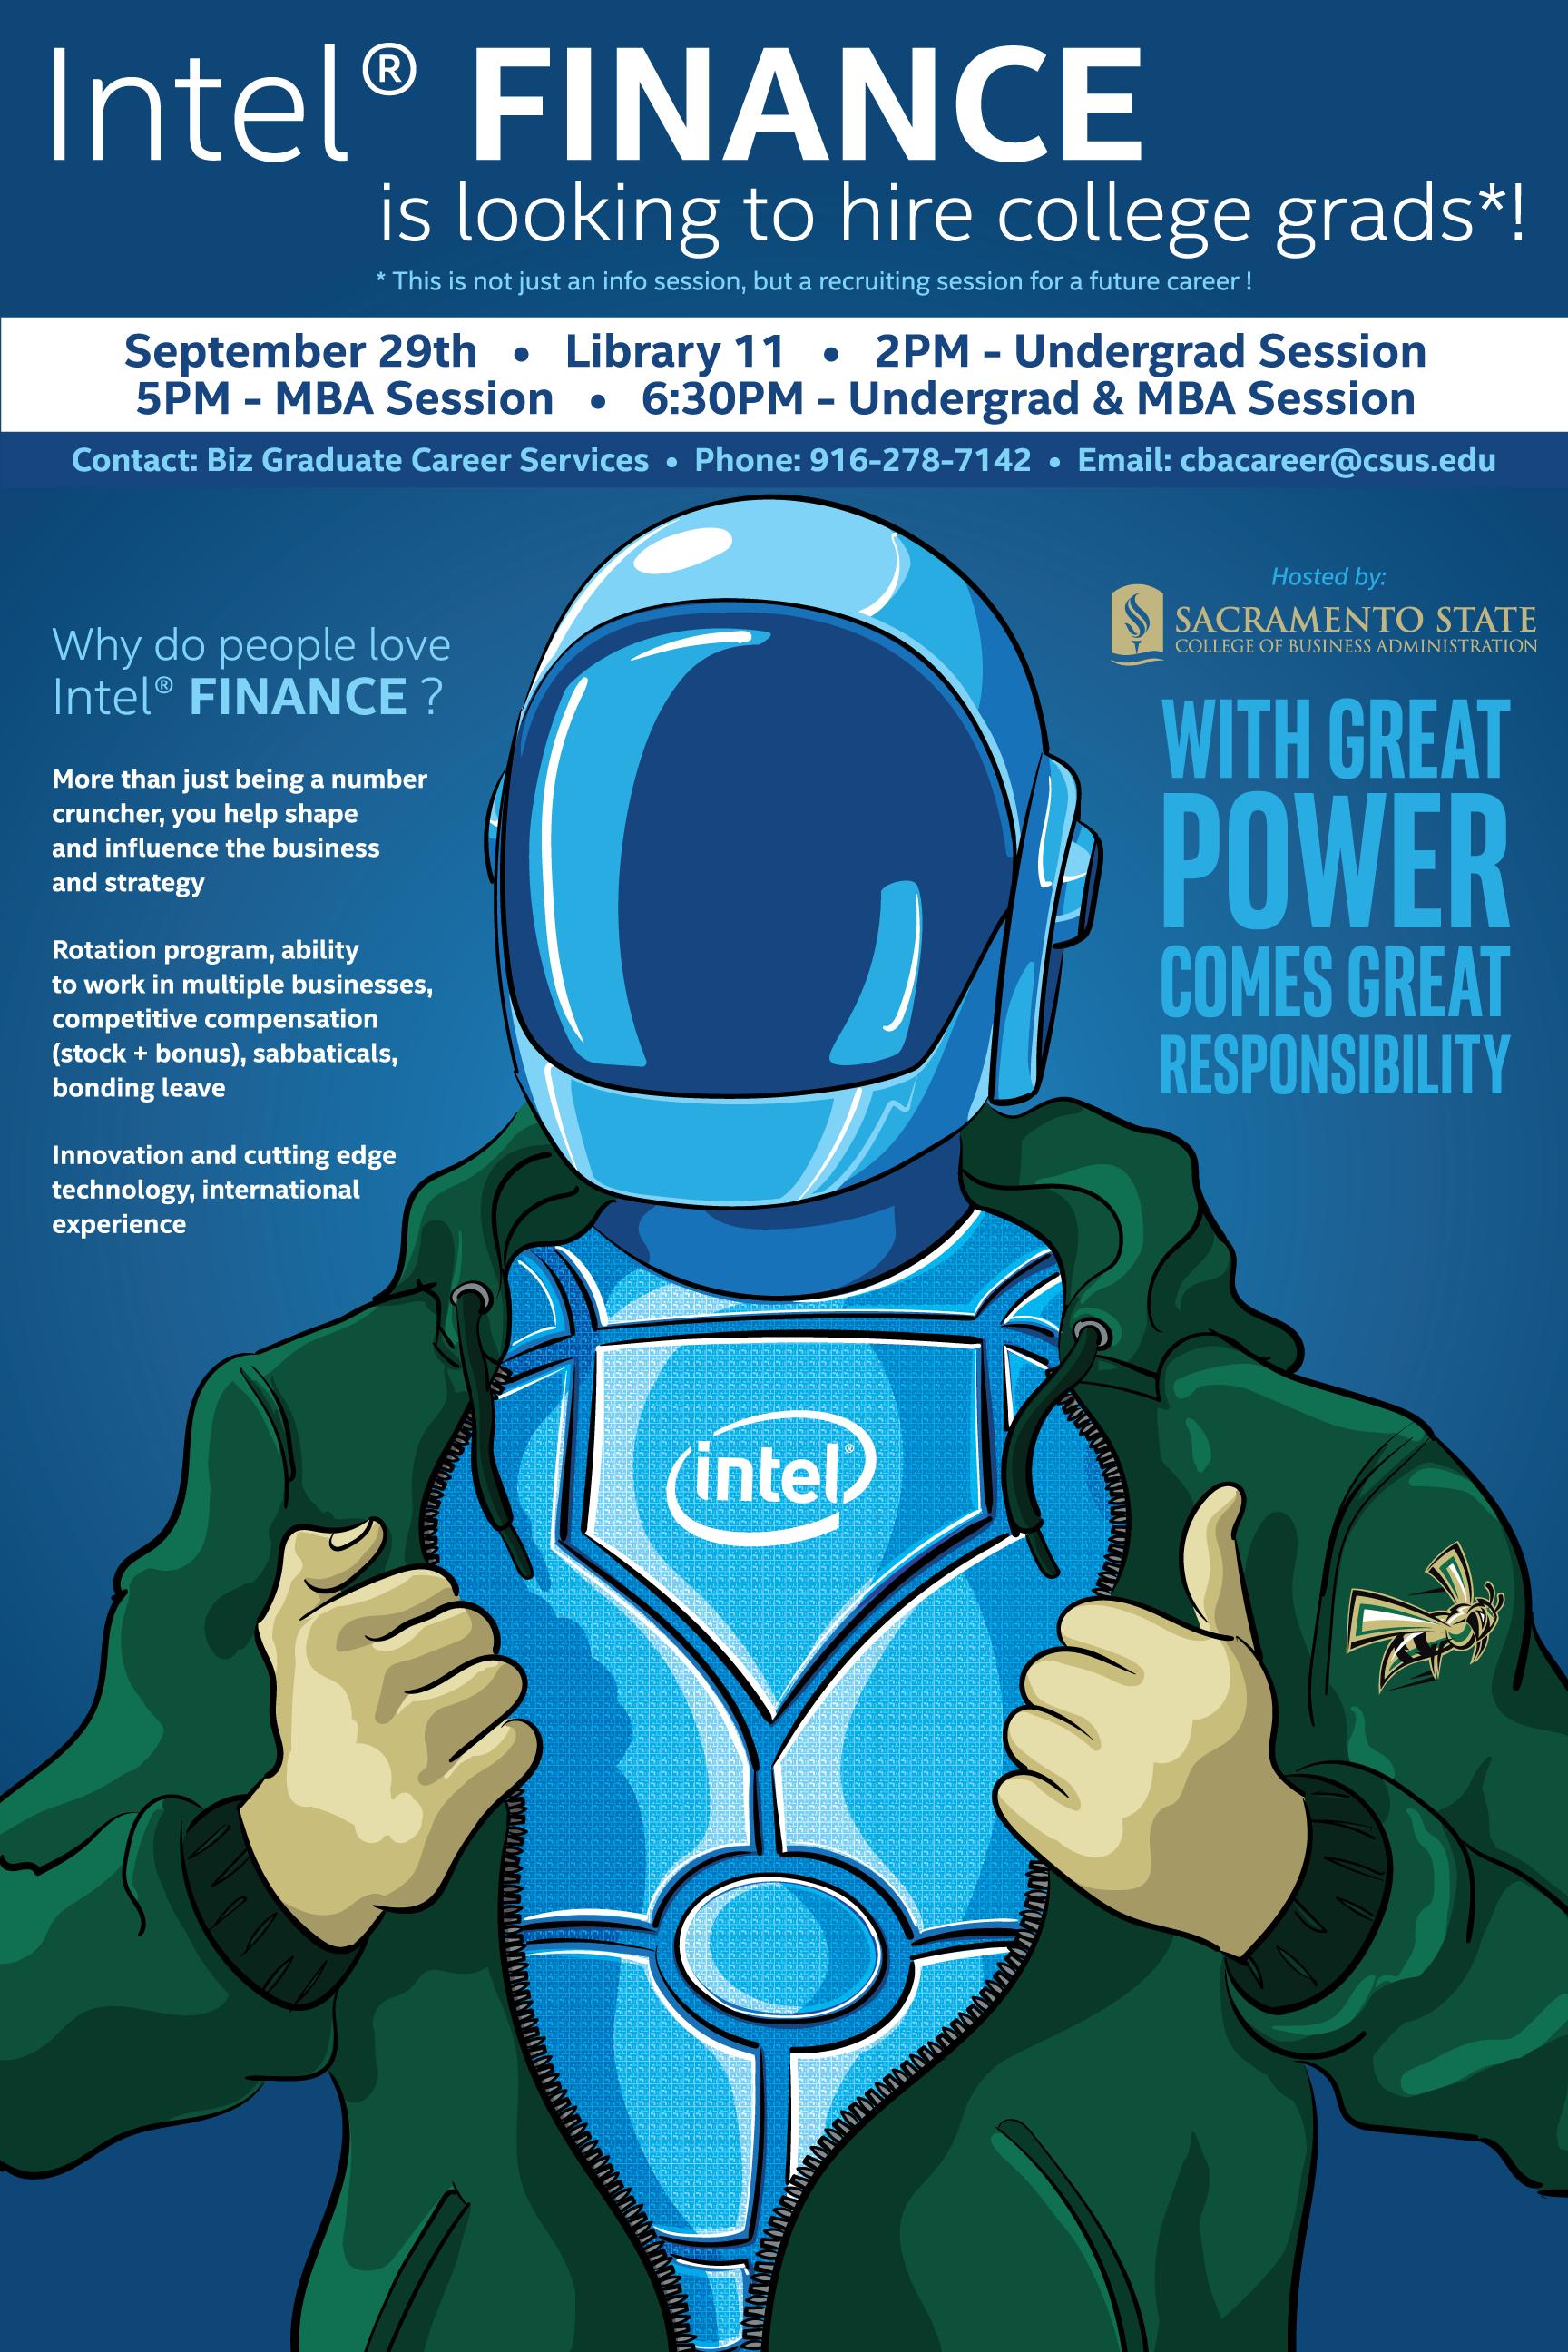 CSUS_Intel_Finance_Poster_SUPER_HERO_FINAL.png